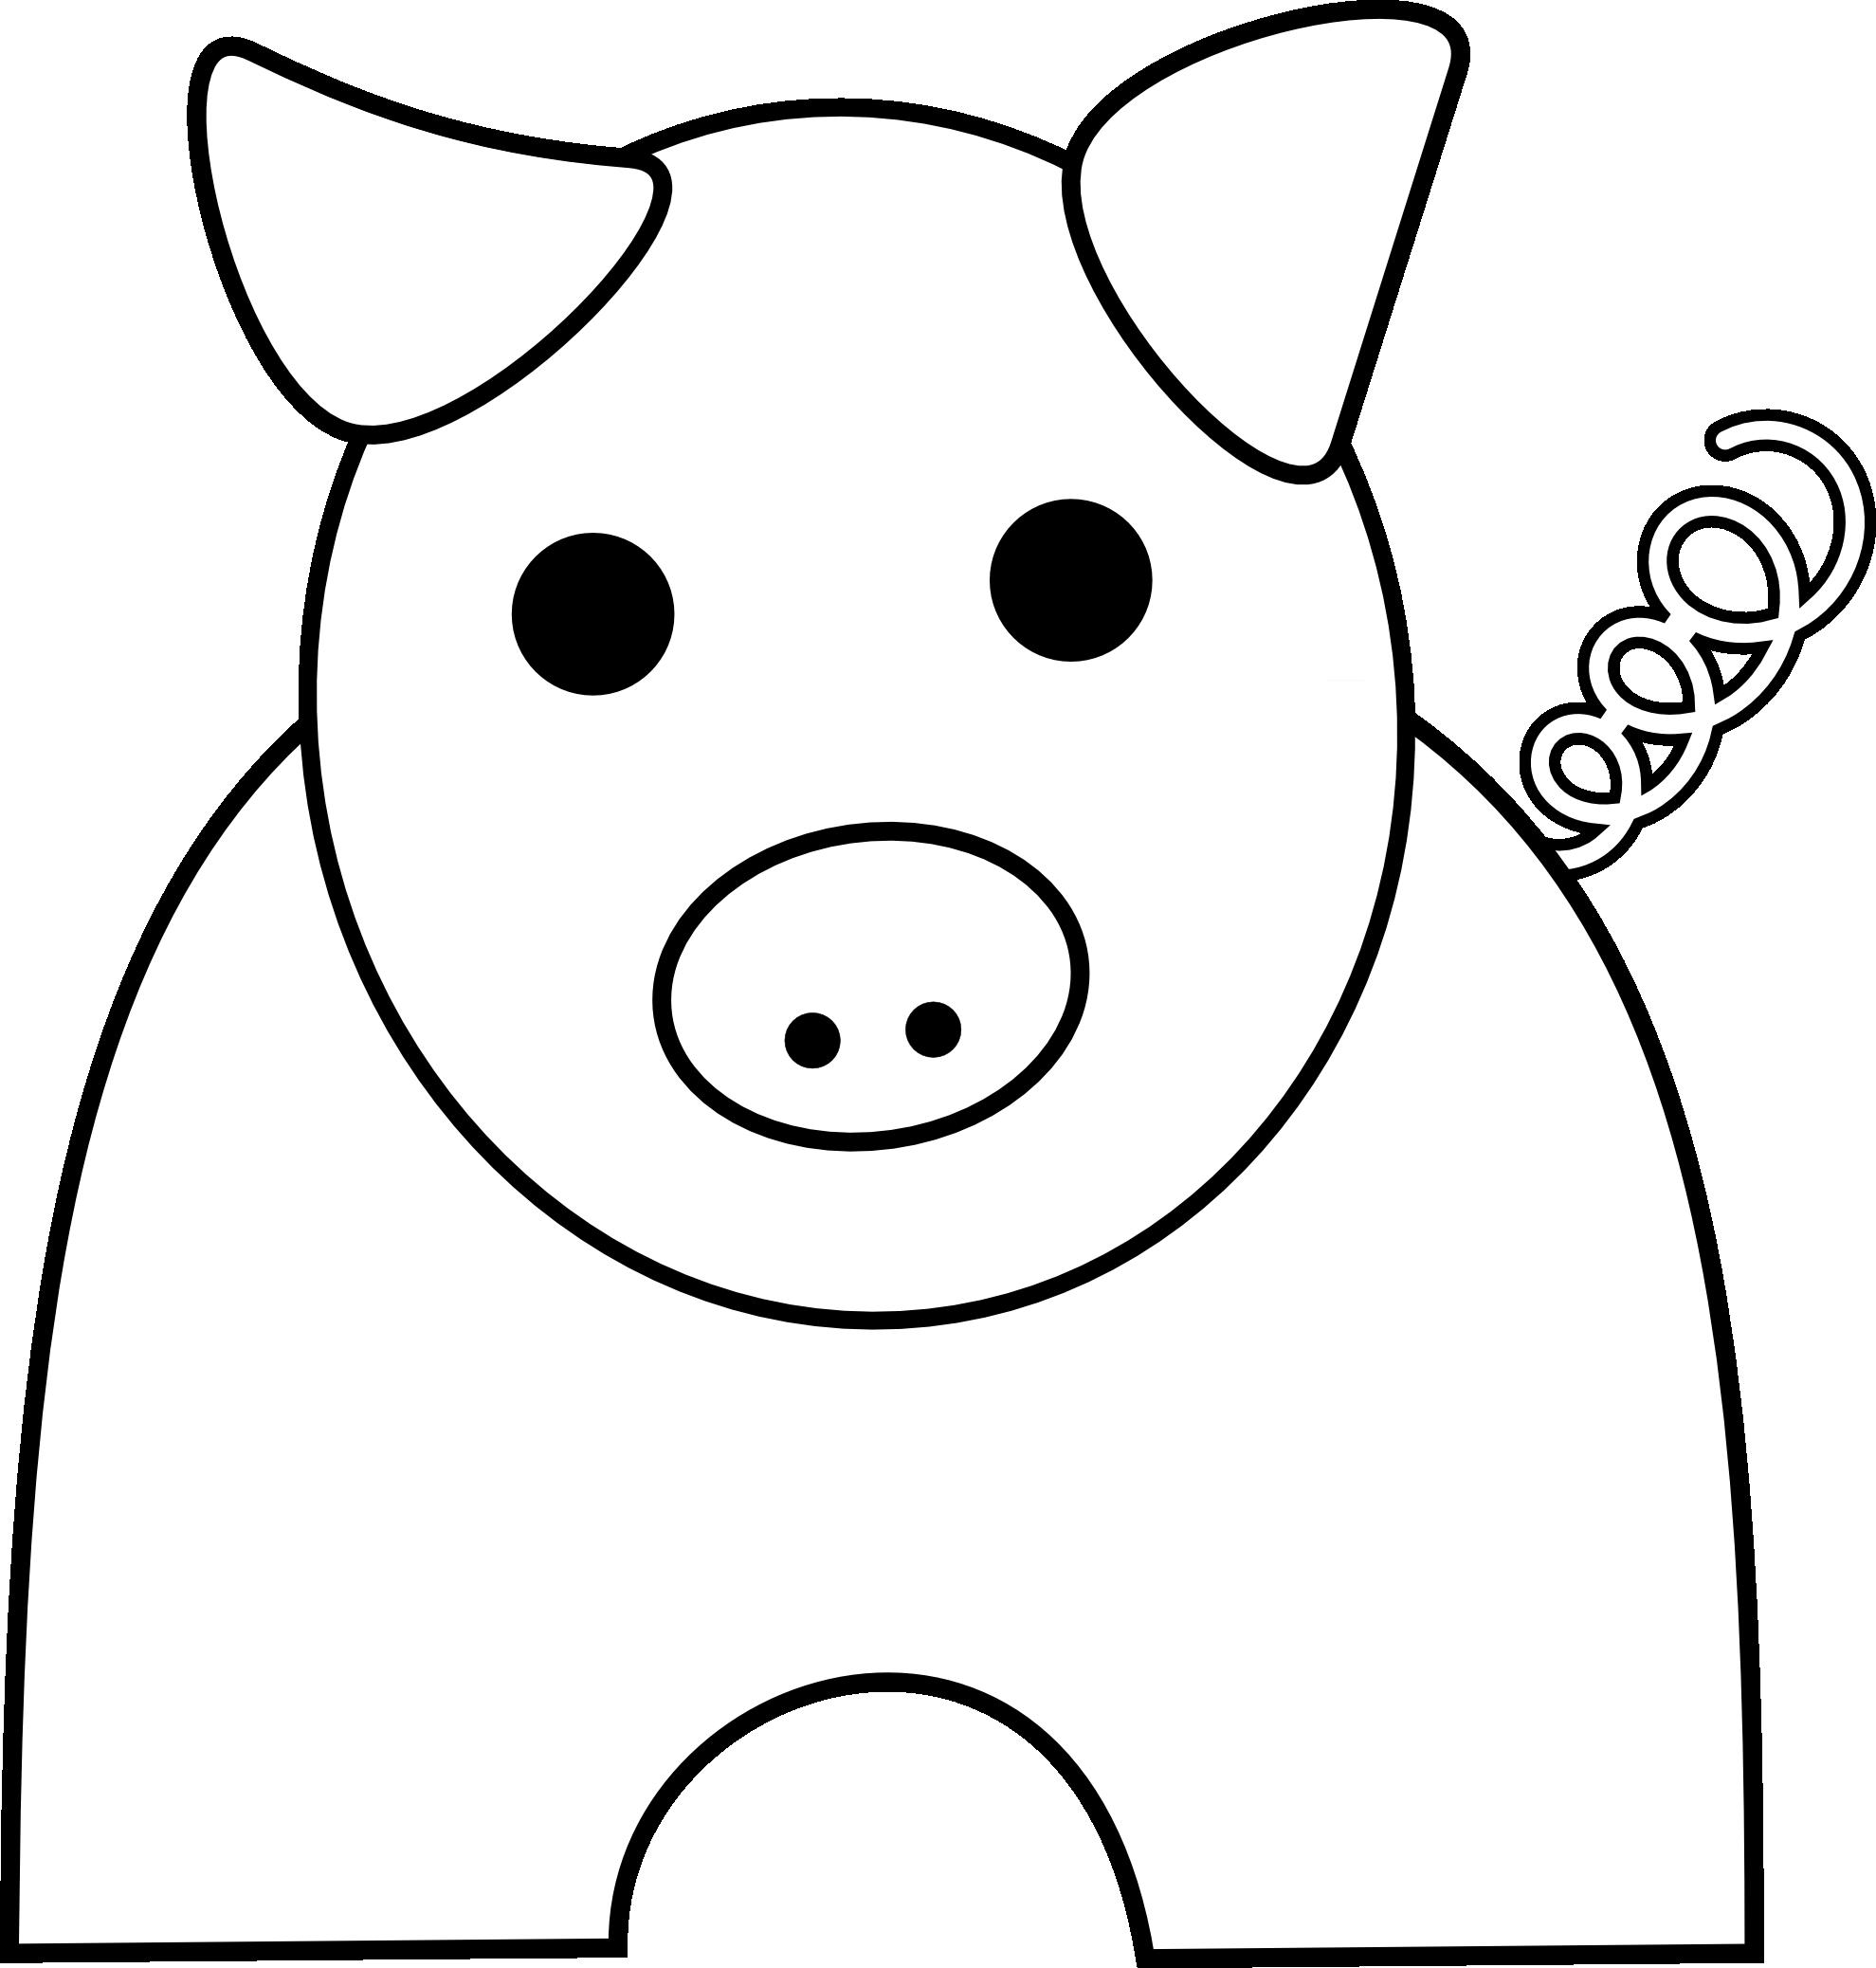 Free Pig Graphics, Download Free Clip Art, Free Clip Art ...